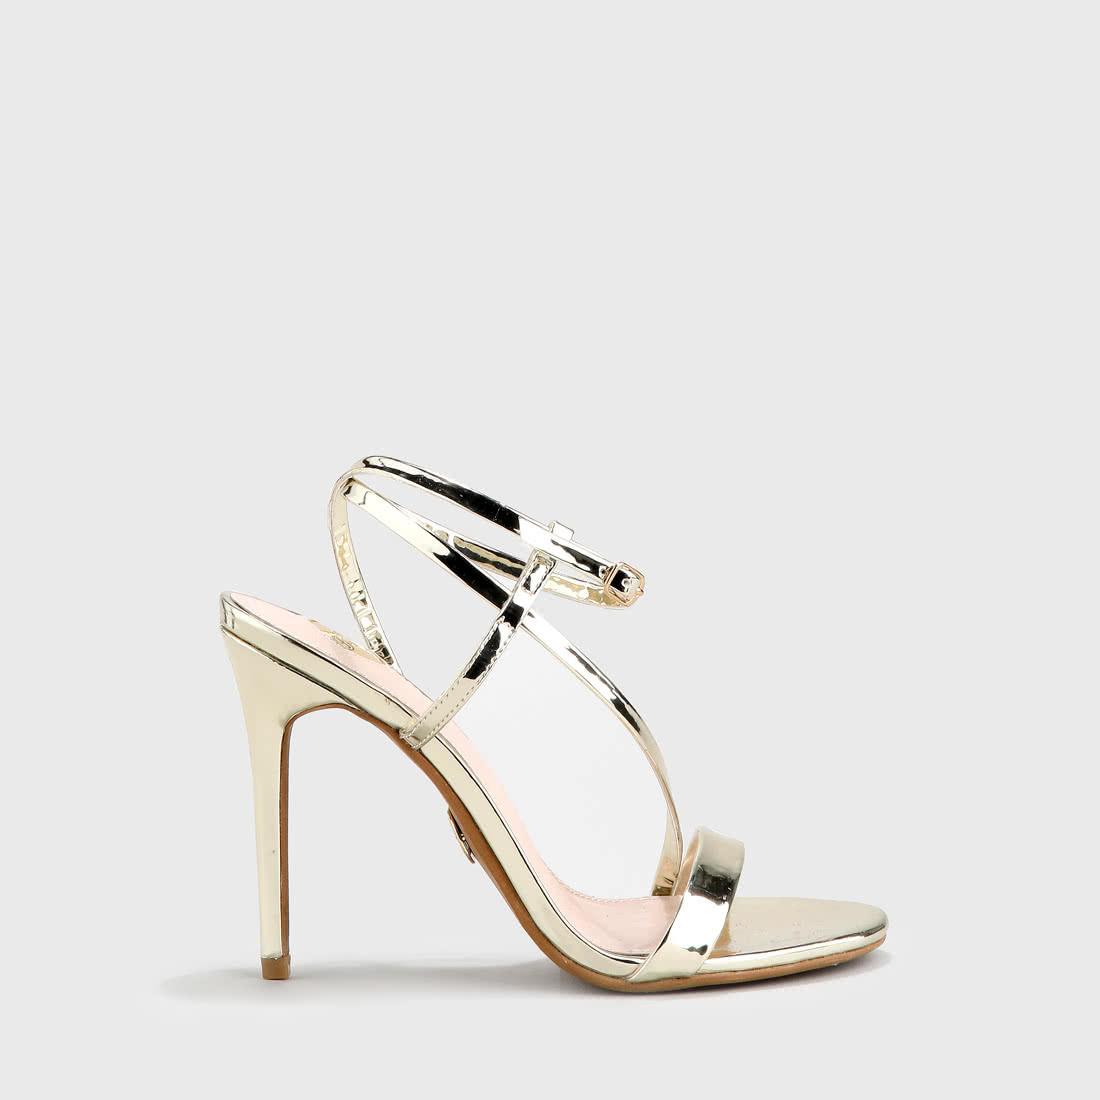 Metallic Lackoptik KaufenBuffalo® Online Emanuelle Sandalette Gold wm8n0N